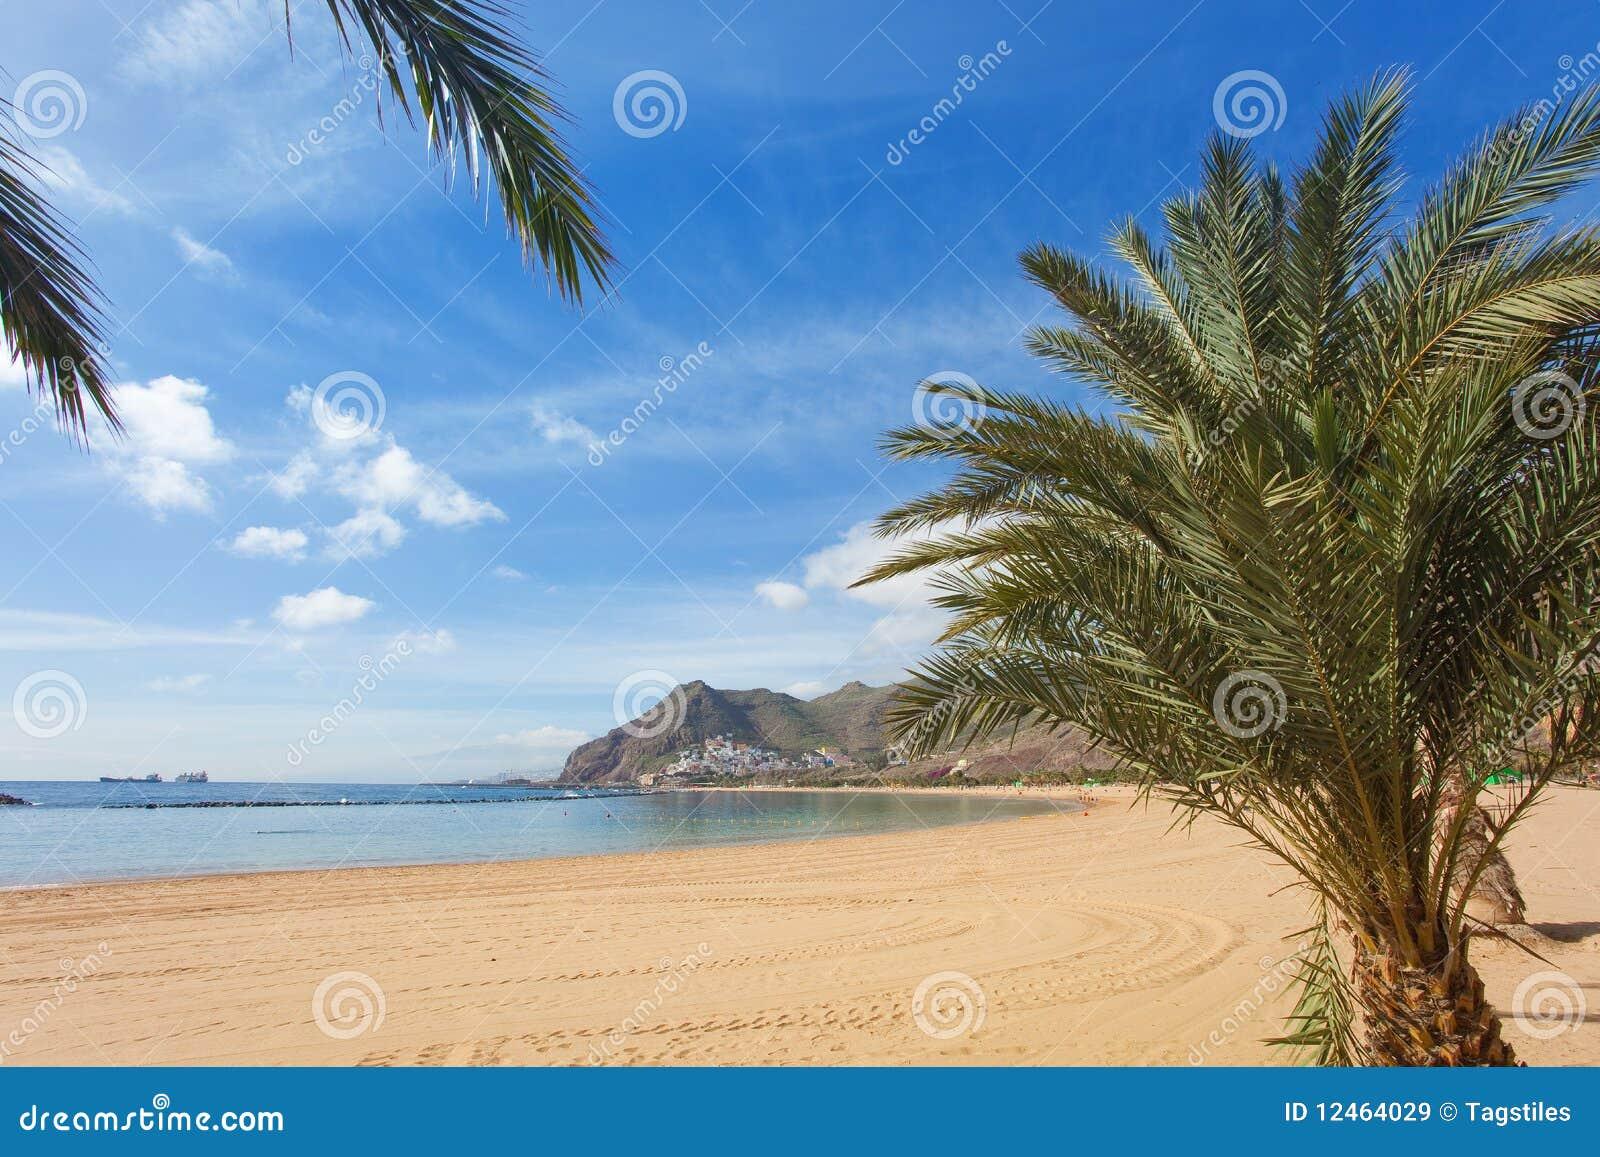 Download San Andrés - Tenerife stockbild. Bild von verlassen, himmel - 12464029